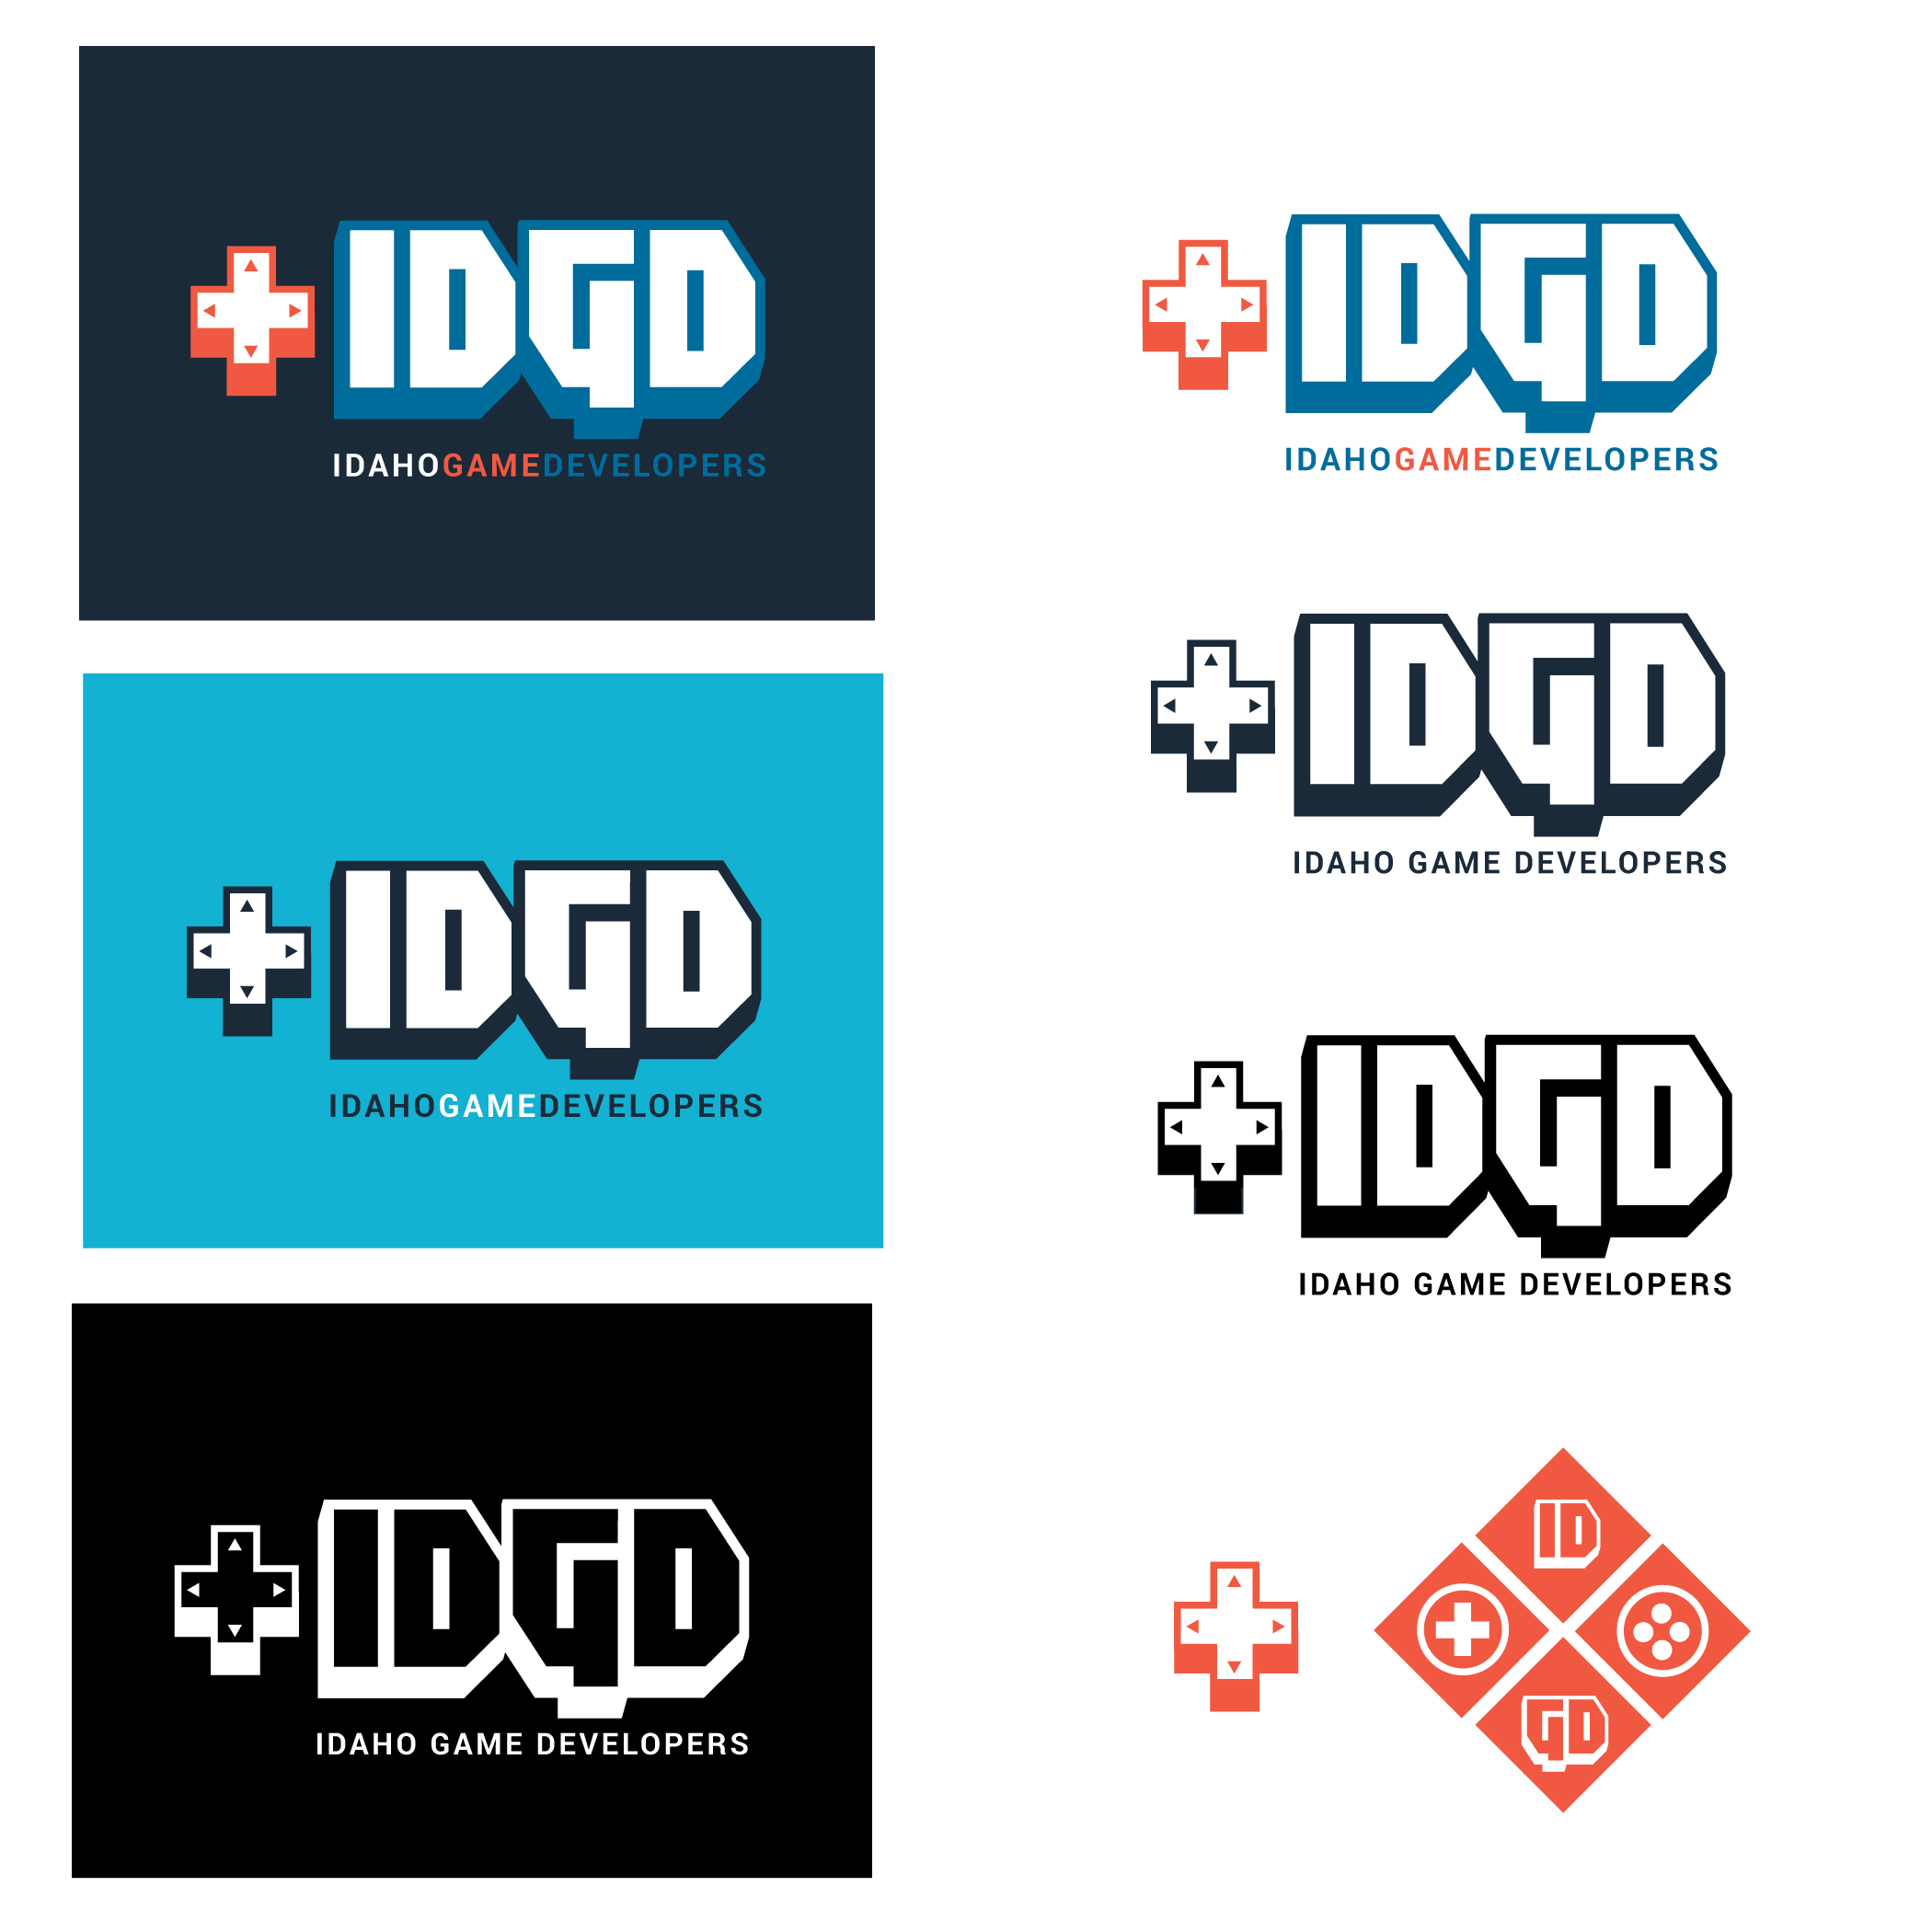 IDGD Rebrand by Ponywolf